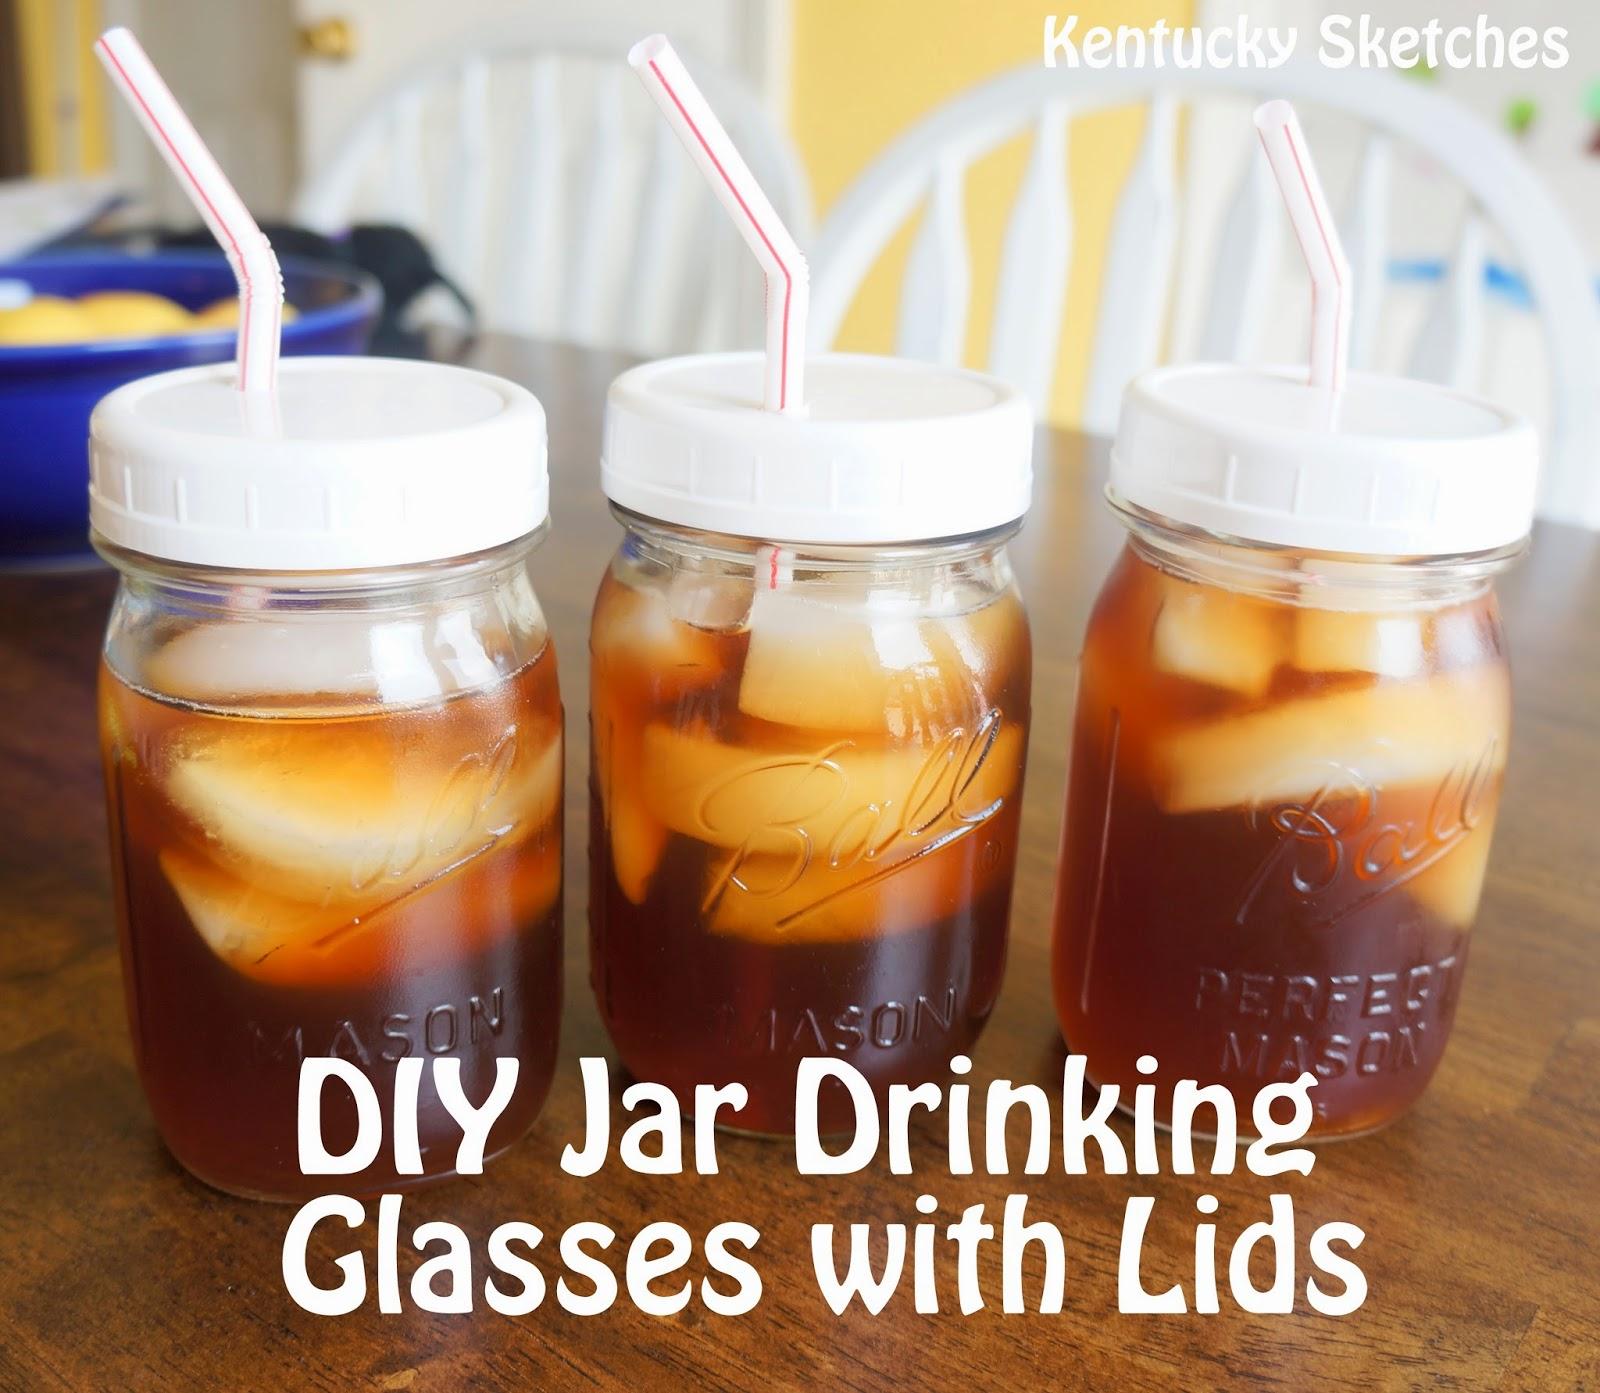 Diy mason jar drinking glasses with lids solutioingenieria Images